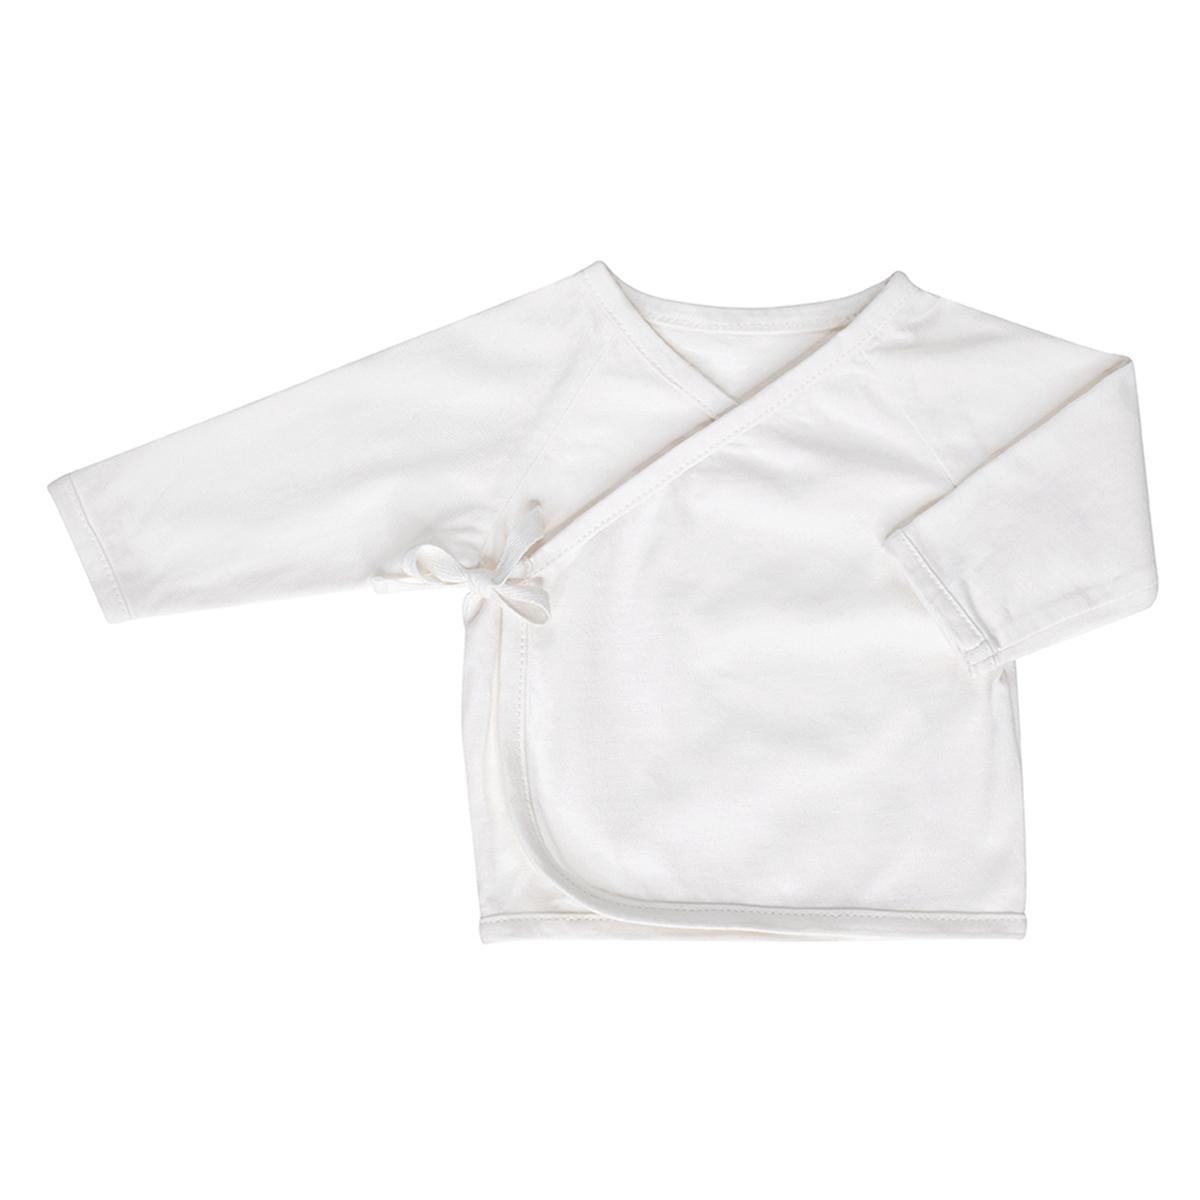 Haut bébé Cardigan Kimono Cream - 1 Mois Cardigan Kimono Cream - 1 Mois